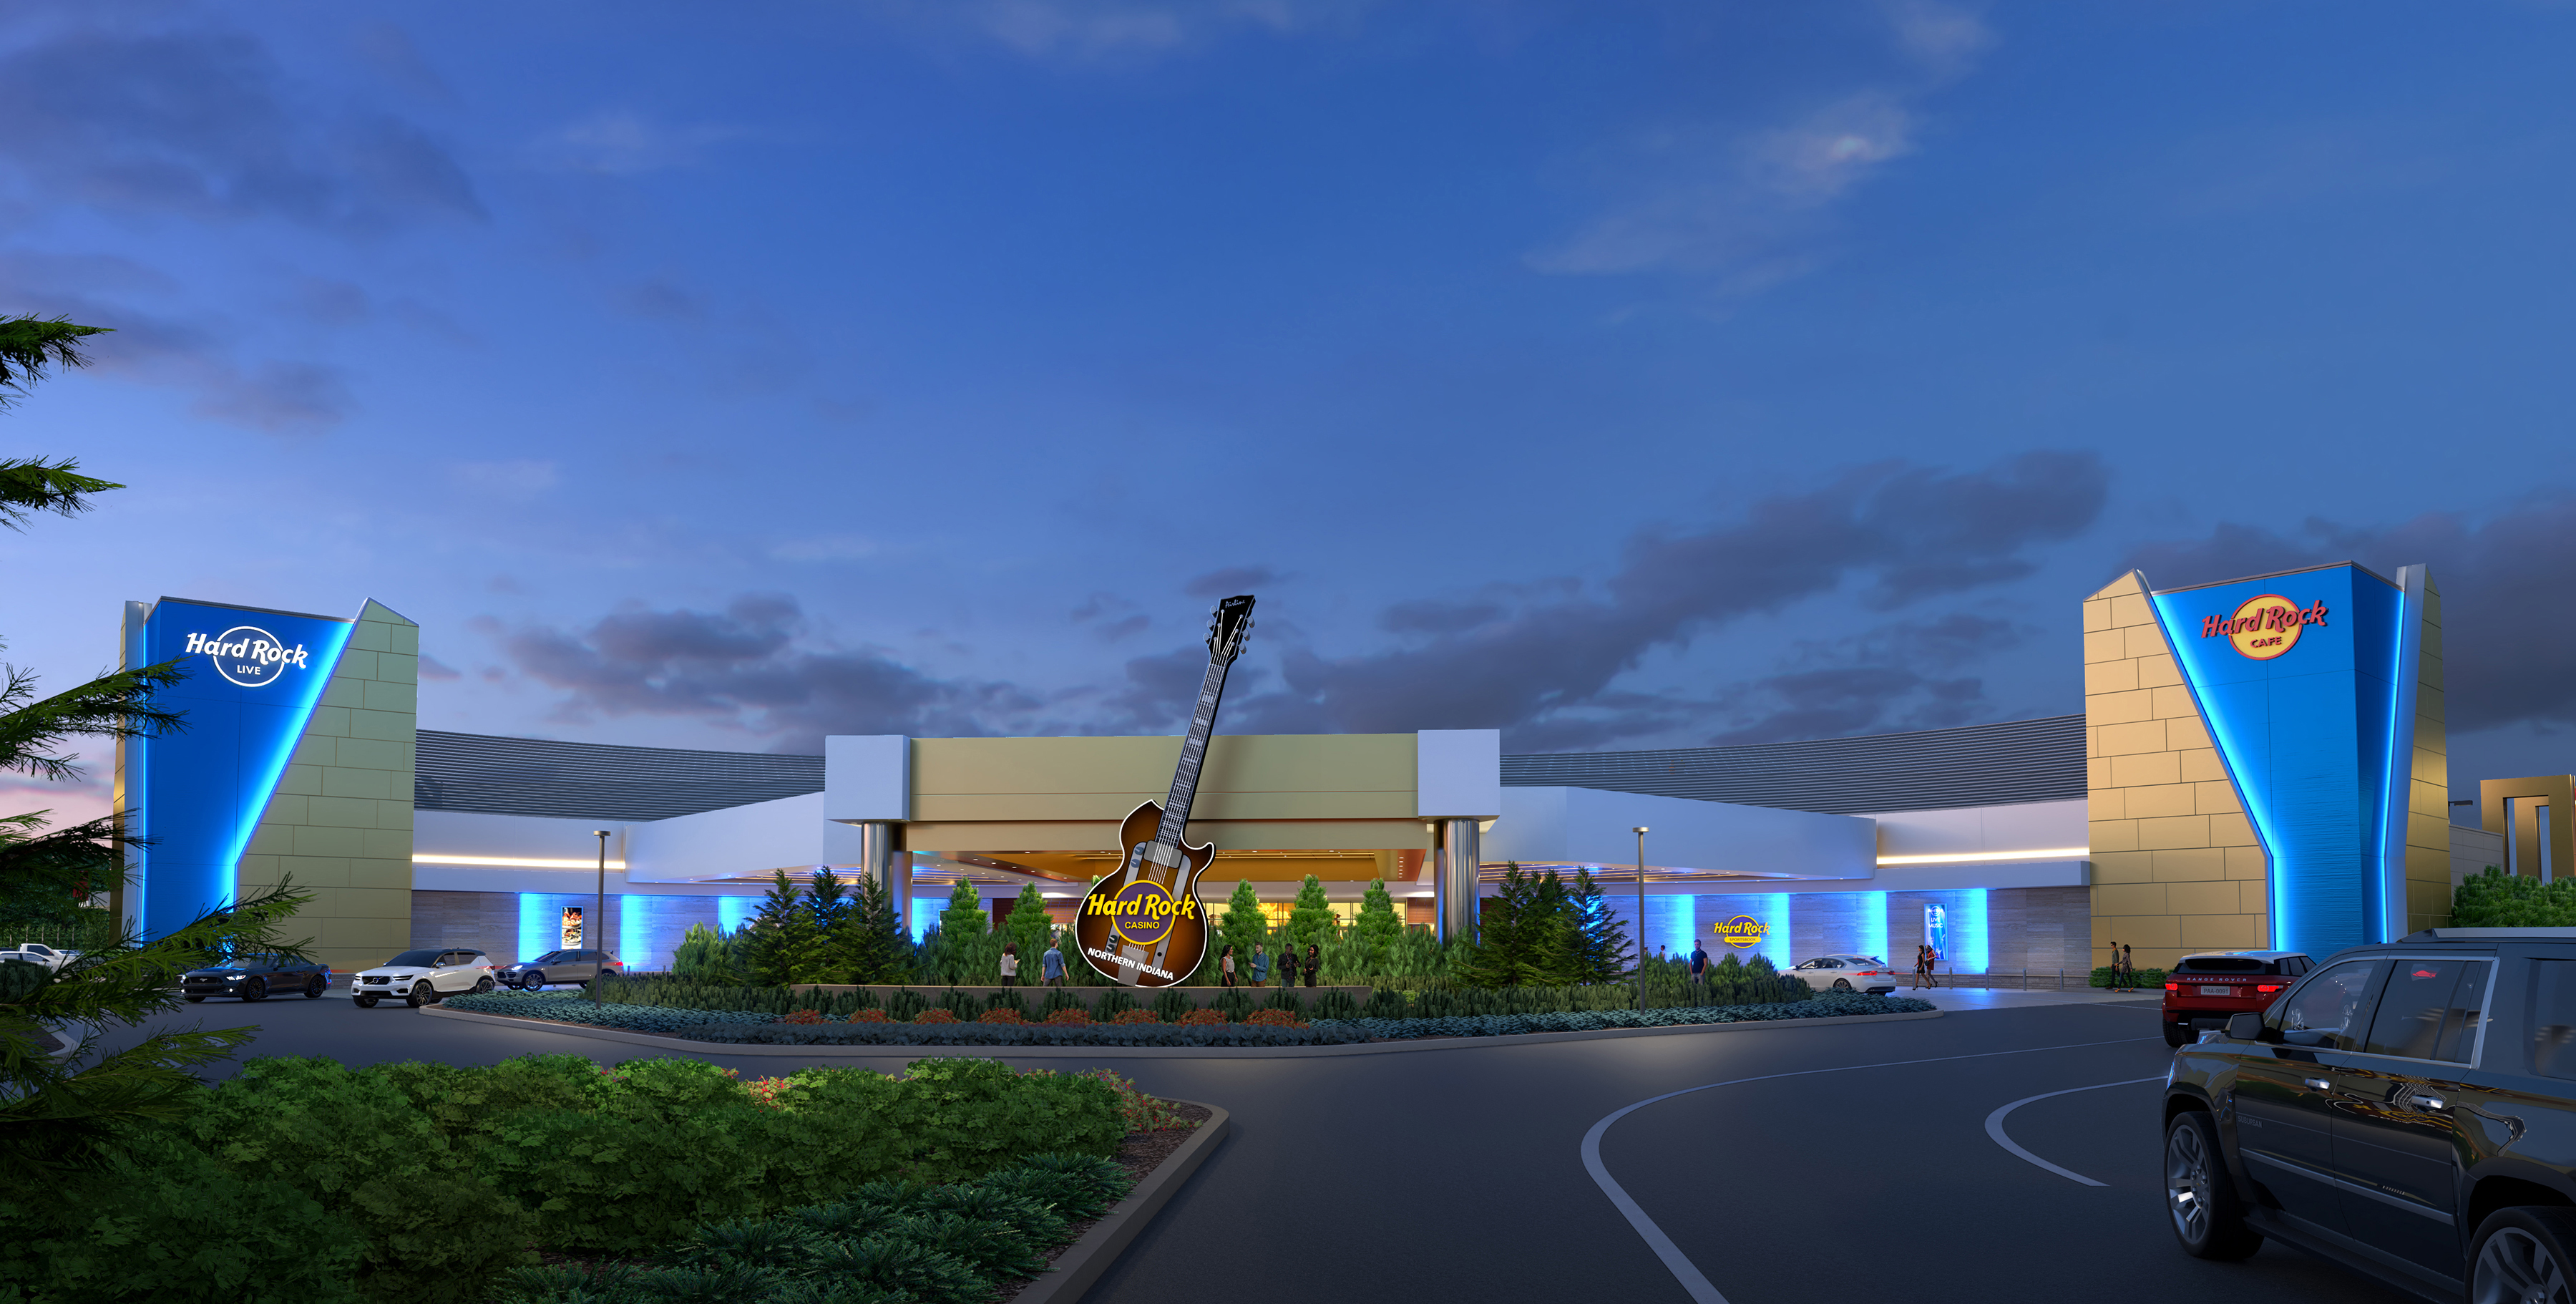 Hard Rock Casino Locations